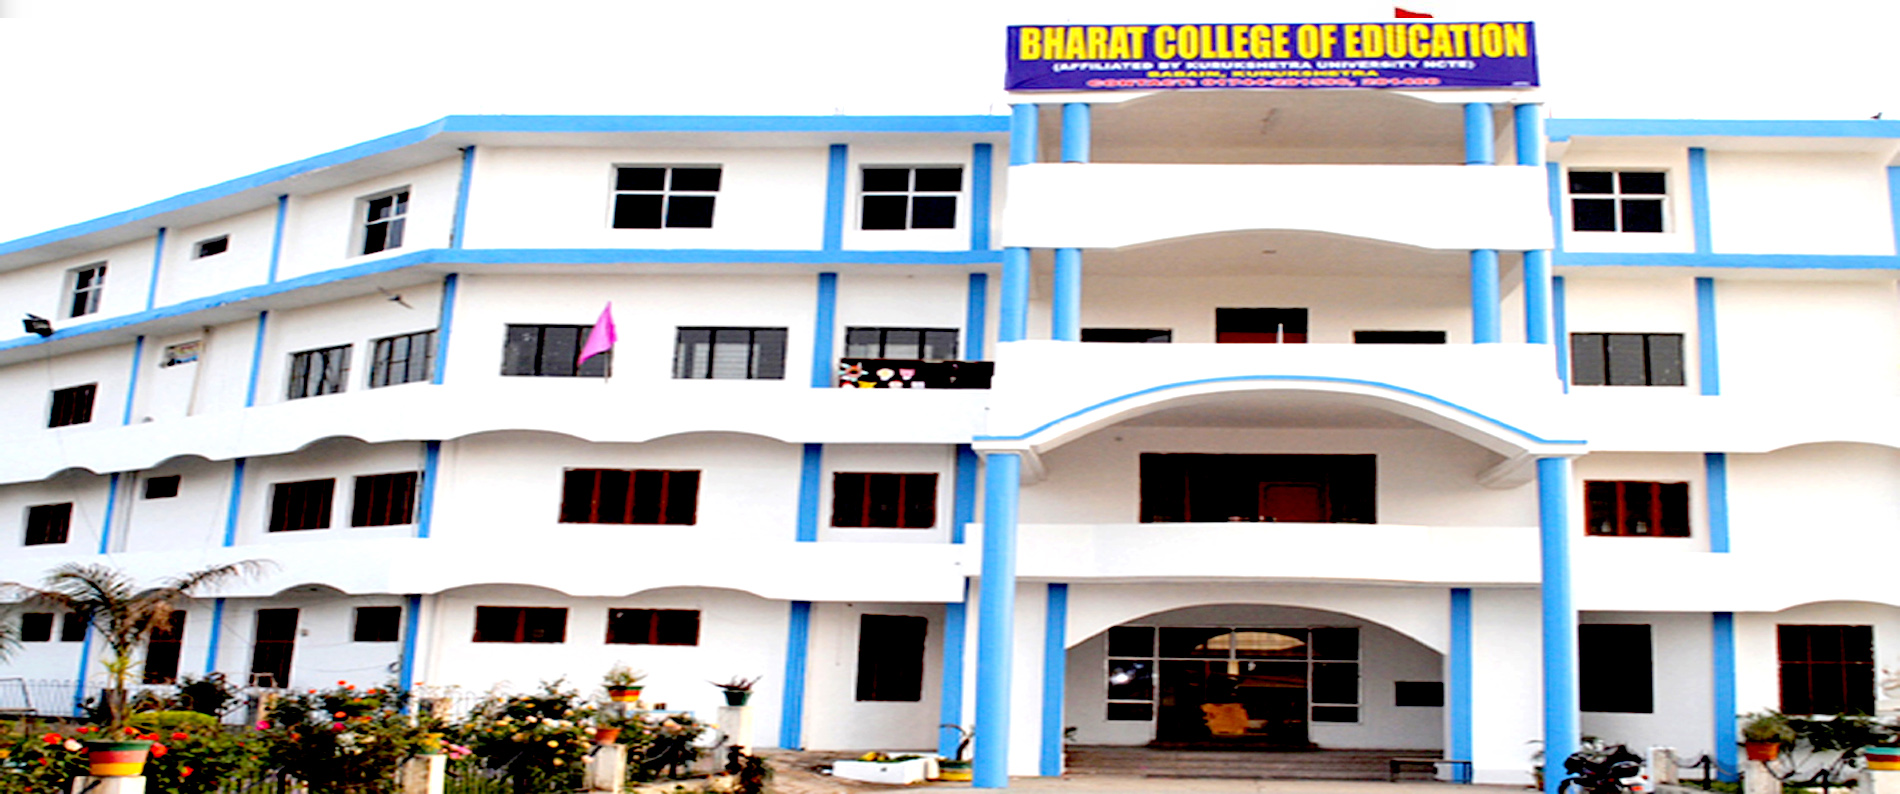 Bharat College of Education